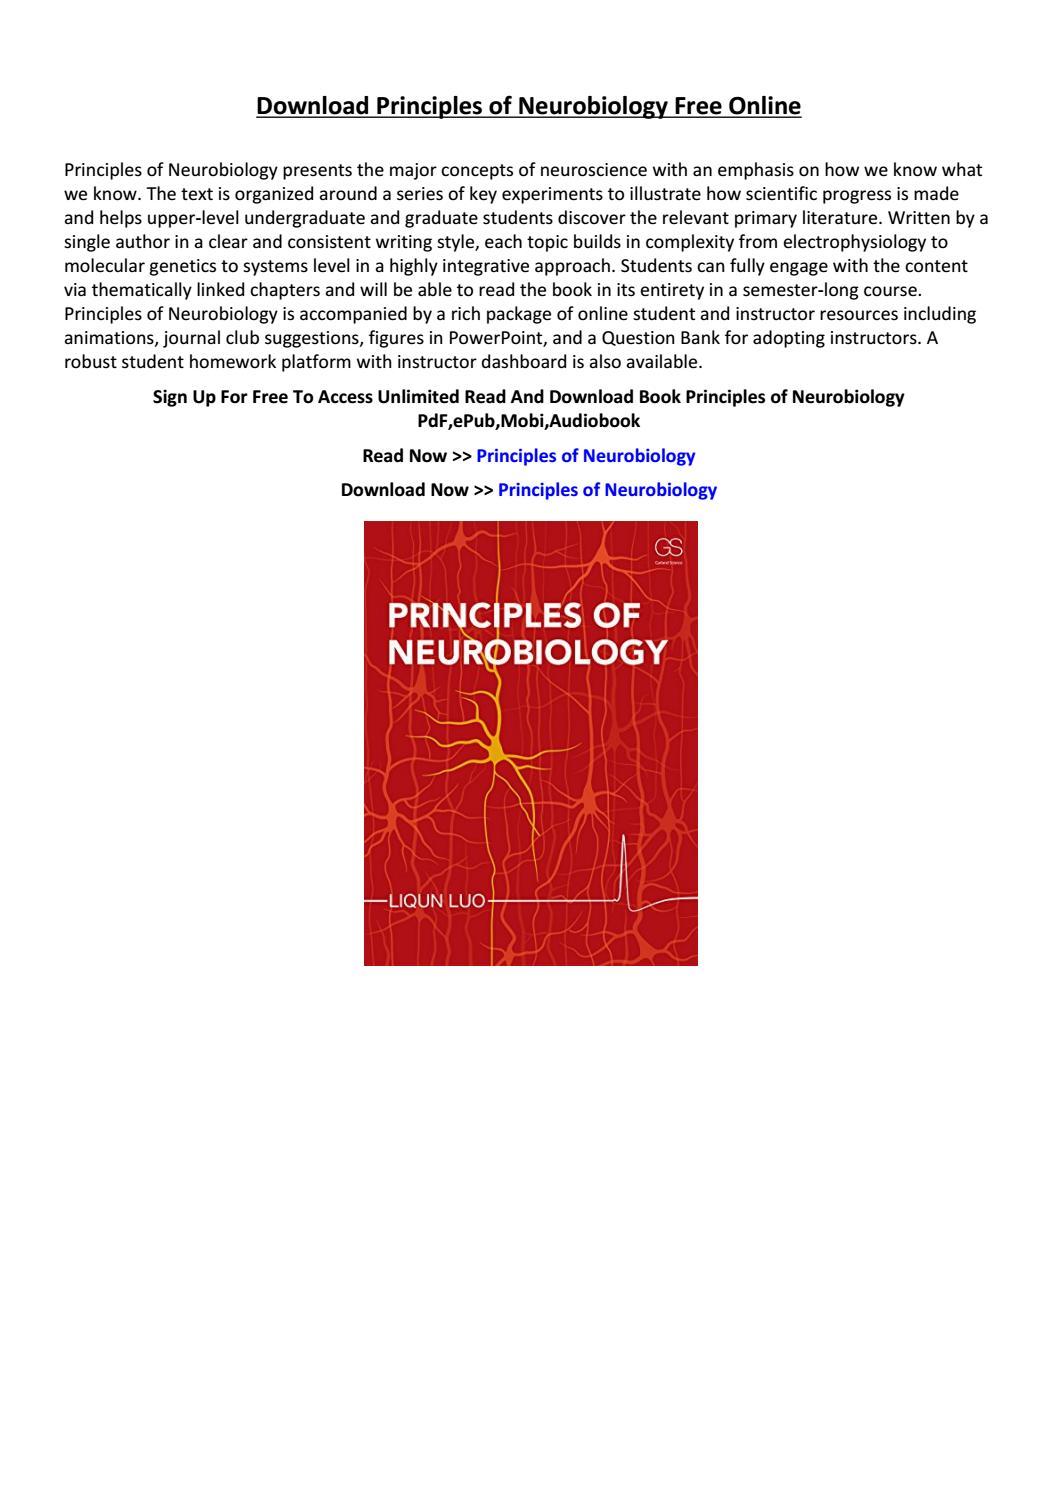 Principles Of Neurobiology By Mkiytredw Issuu